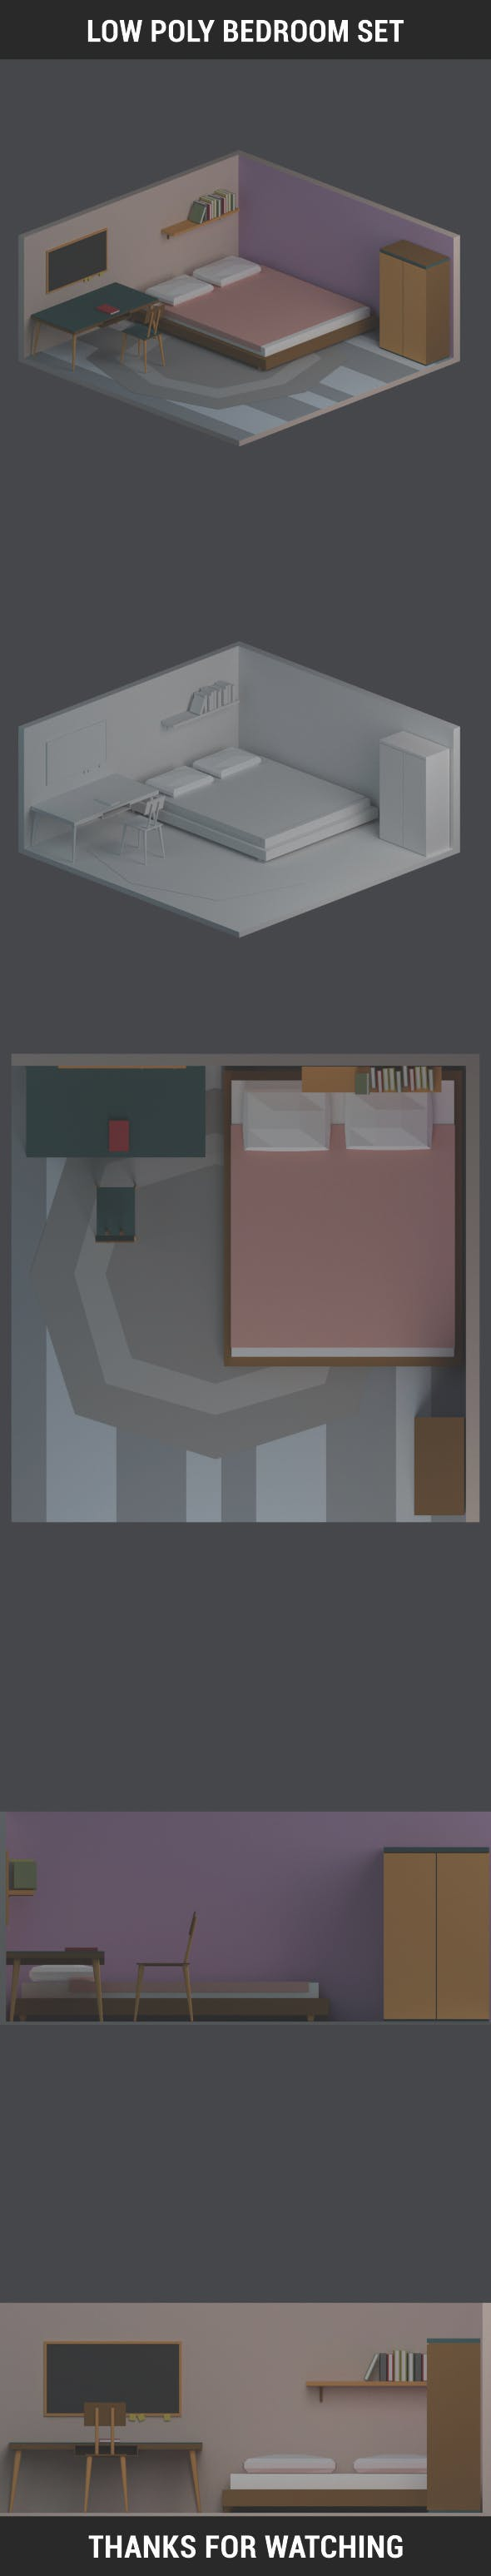 Low Poly Bedroom Set - 3DOcean Item for Sale